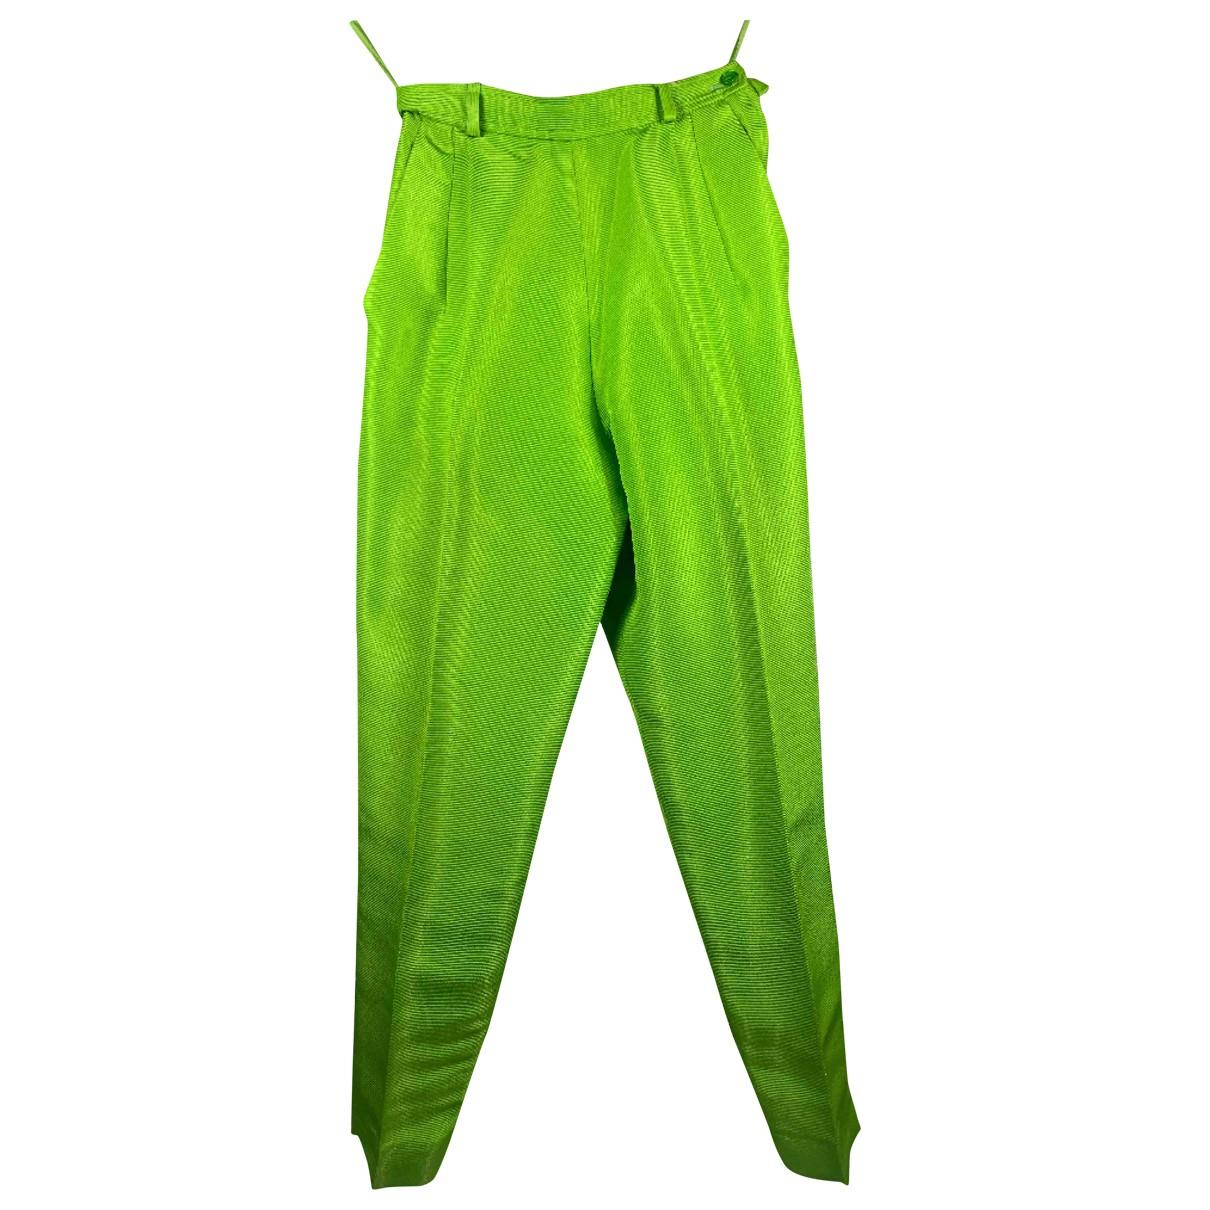 Pantalon zanahoria de Seda Yves Saint Laurent